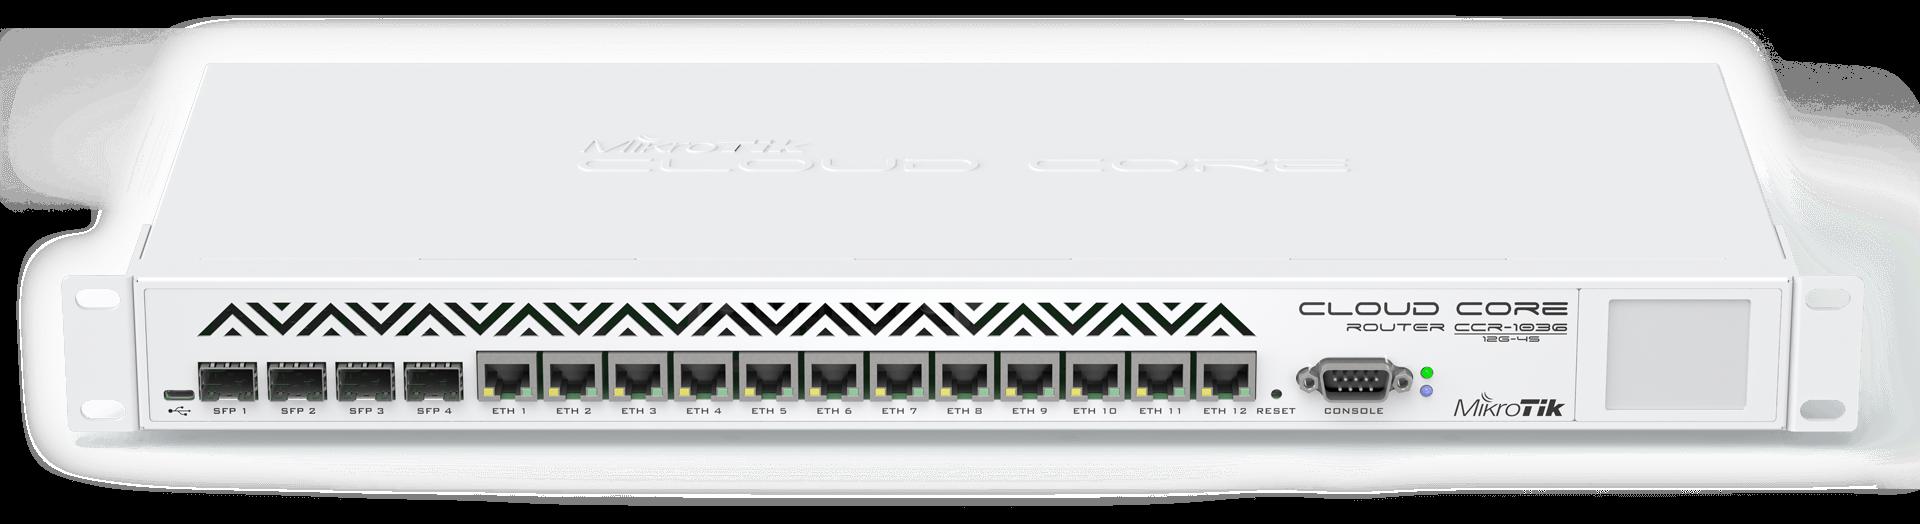 CCR1036-8G-2S+-EM 8xGB Ethernet 2 x 10Gb SFP+ CCR1036-8G-2S+-EM 8xGB